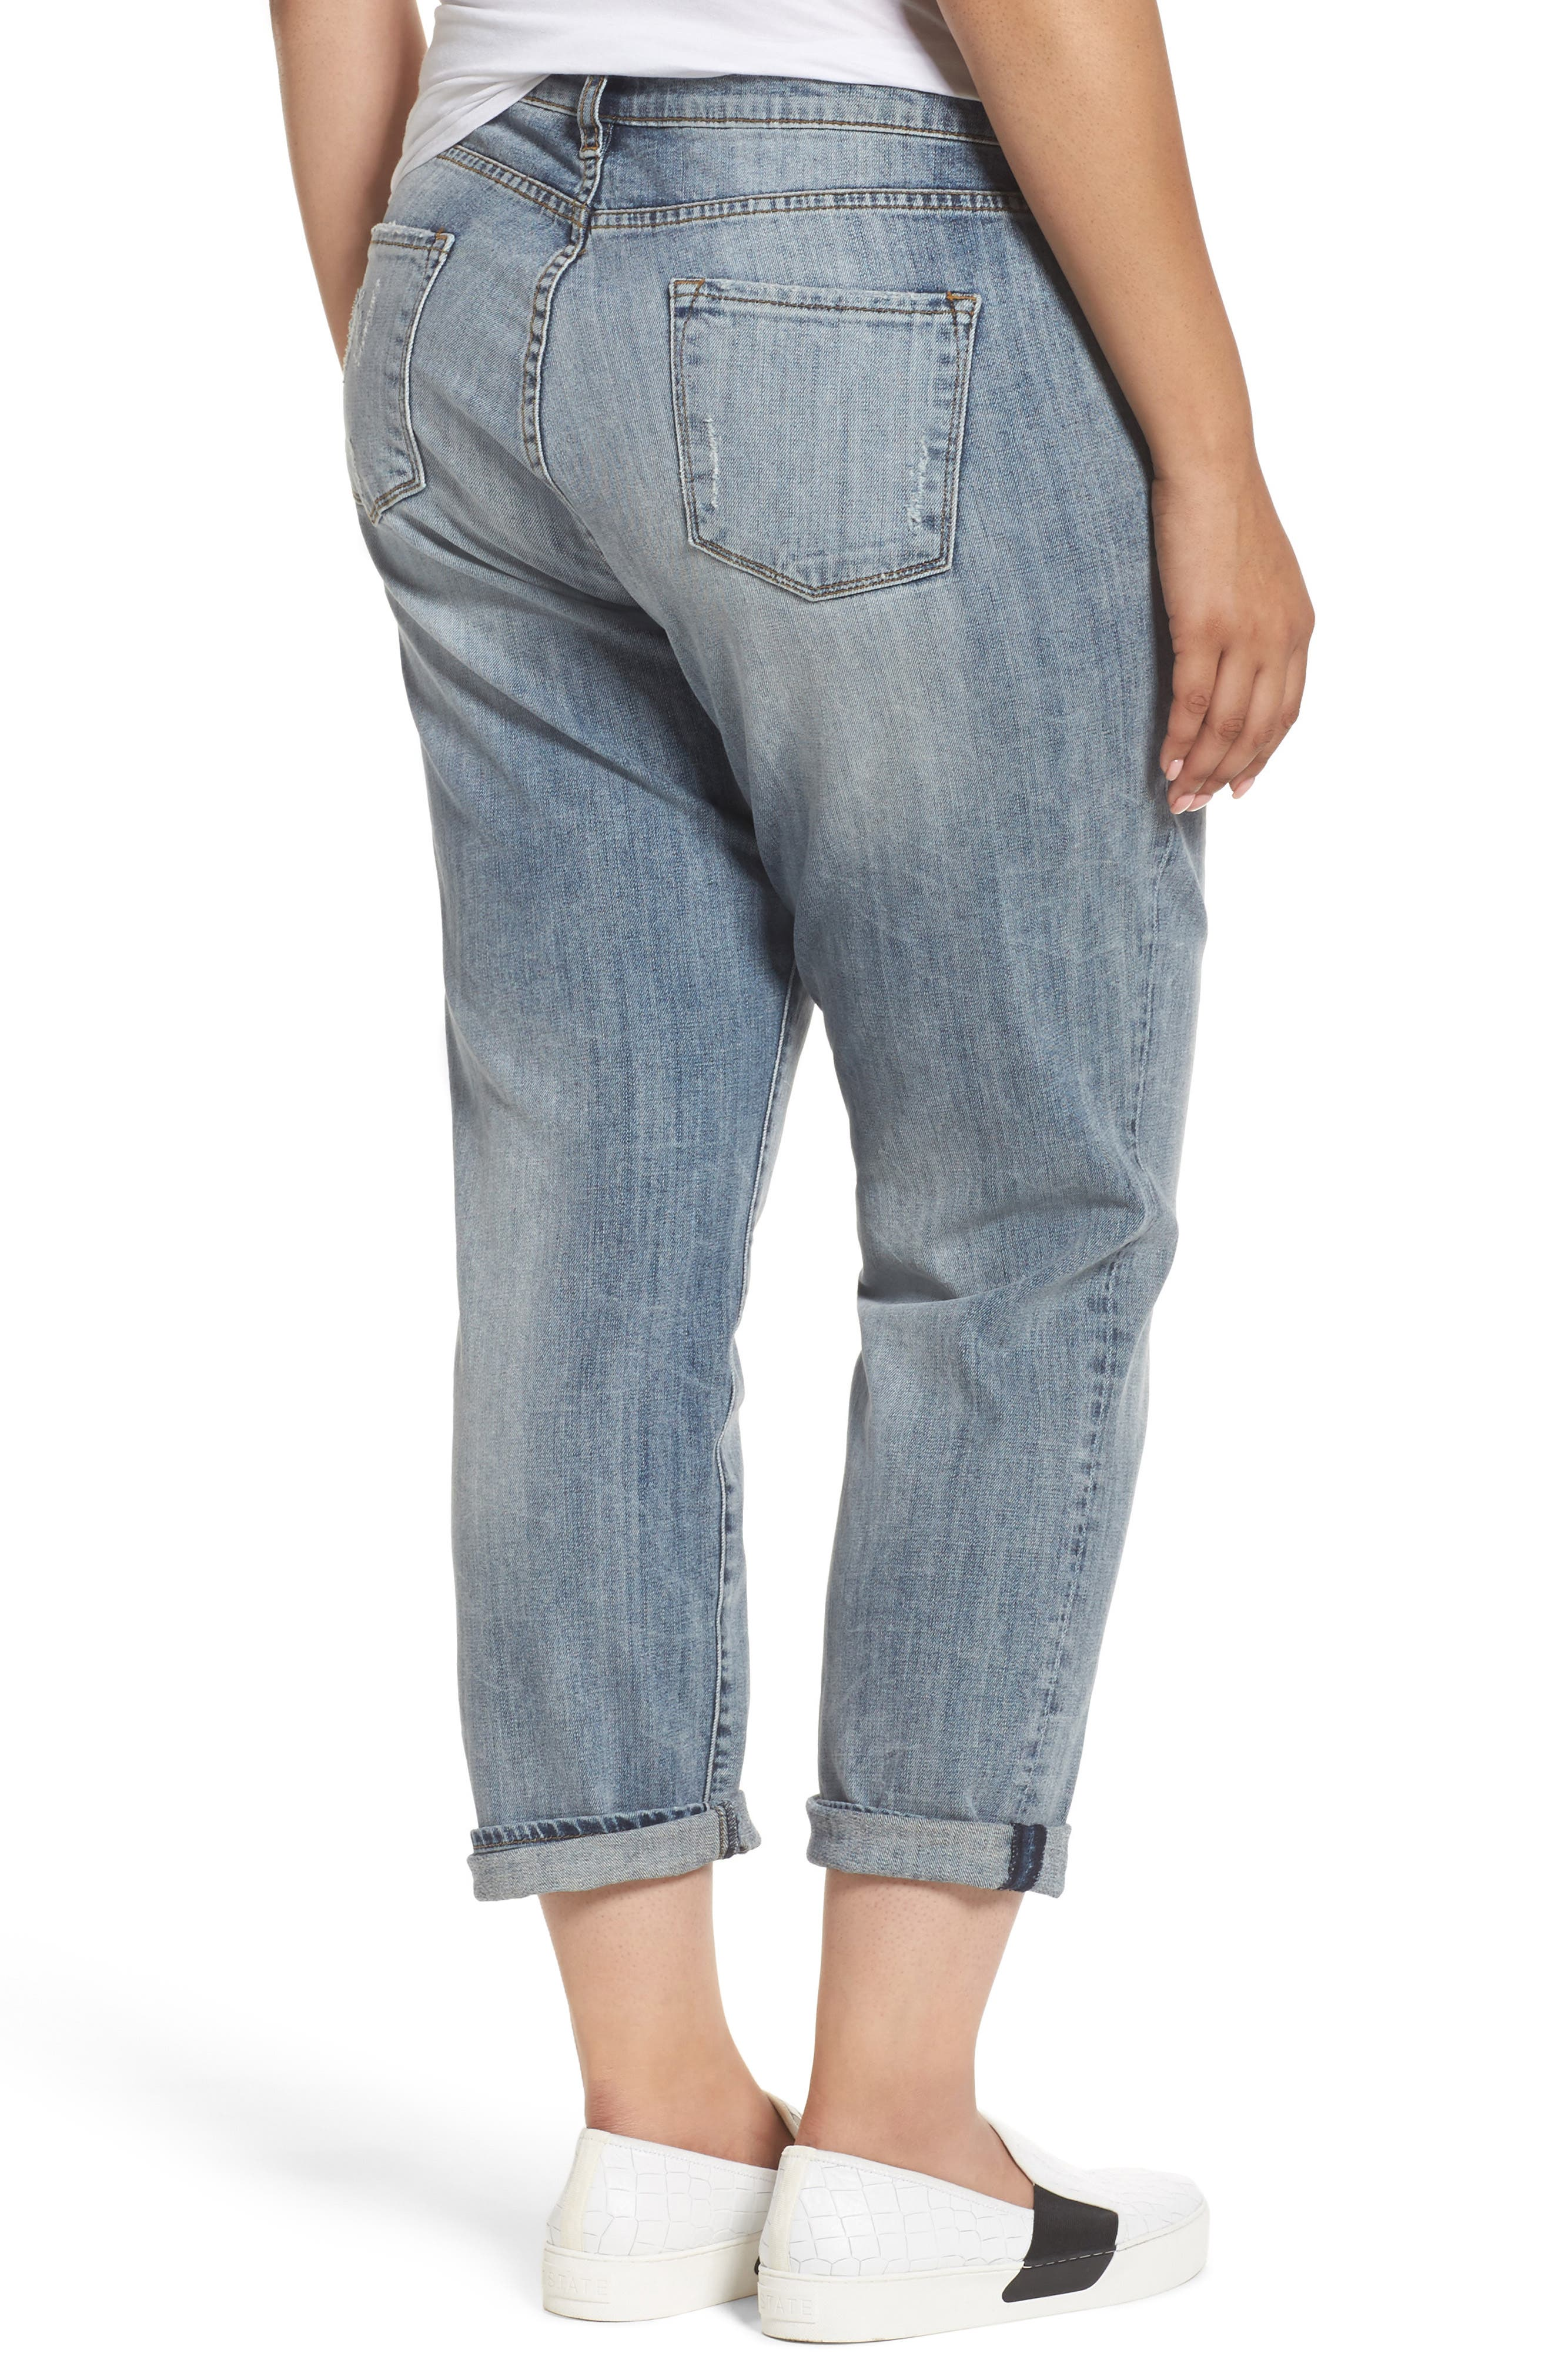 Alternate Image 2  - KUT from the Kloth Catherine Stretch Distressed Boyfriend Jeans (Regarded) (Plus Size)